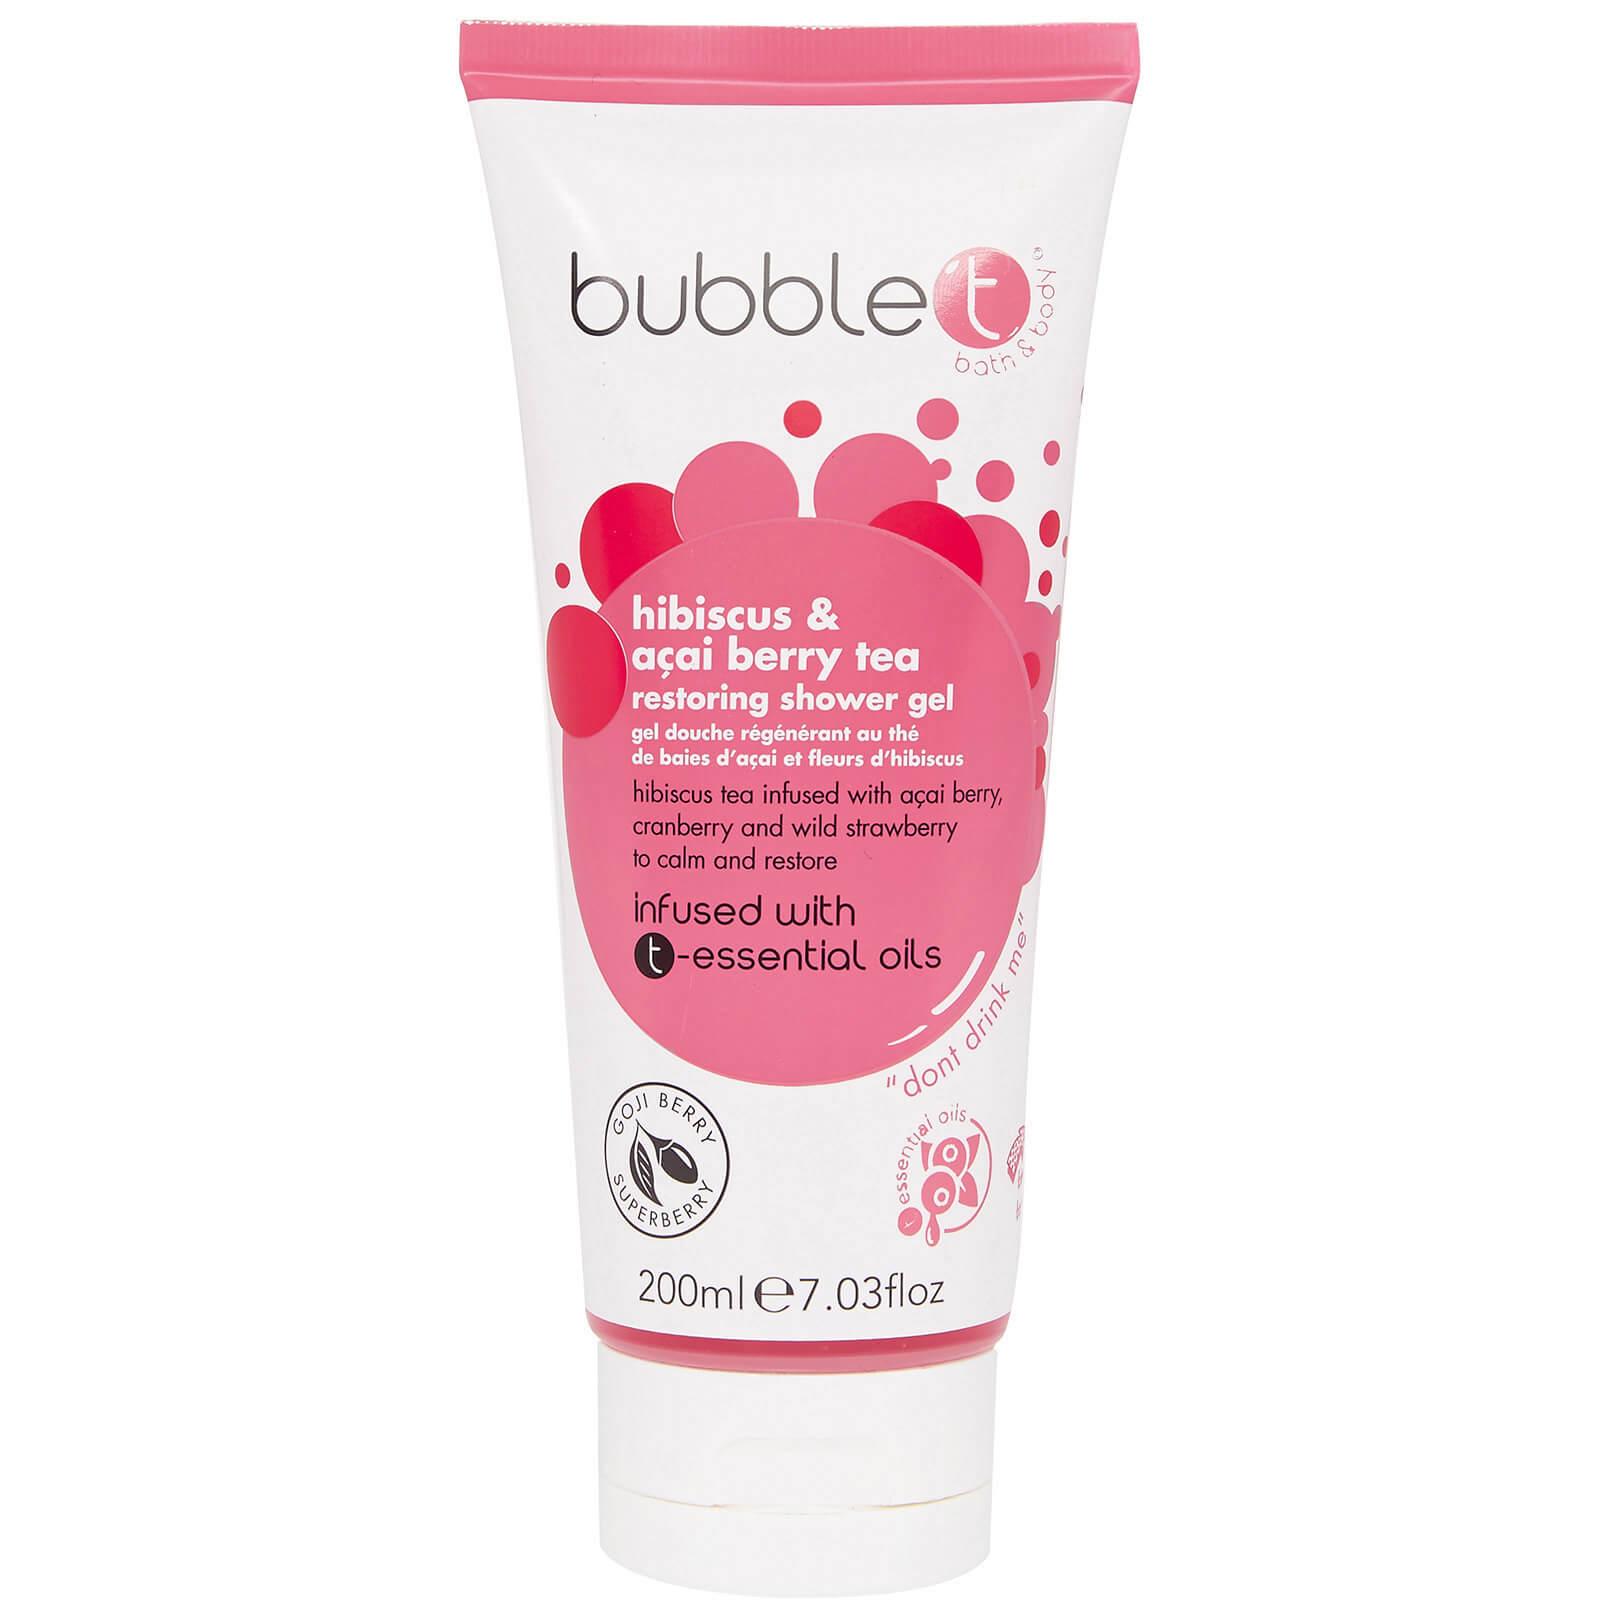 Купить Bubble T Shower Gel - Hibiscus & Acai Berry Tea 200 мл